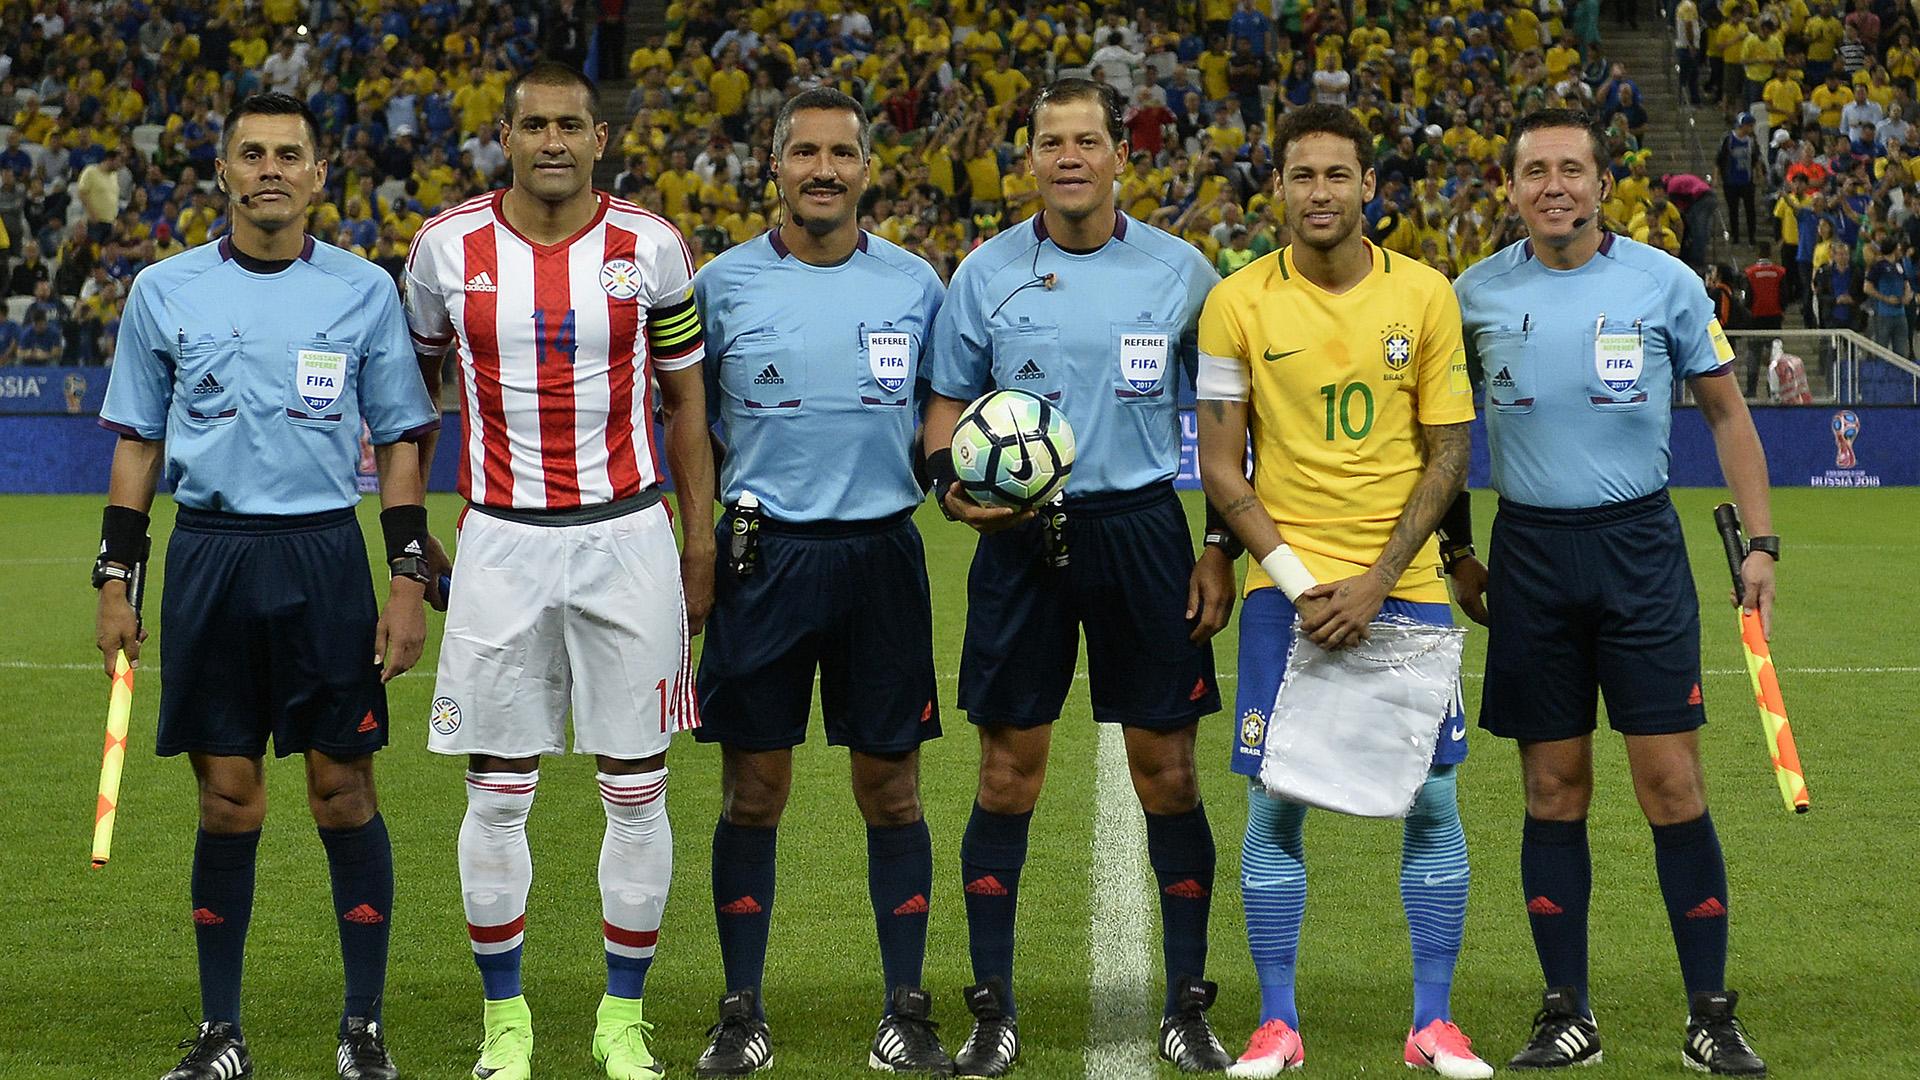 Neymar Paulo da Silva Brasil Paraguai Eliminatorias 2018 28032017